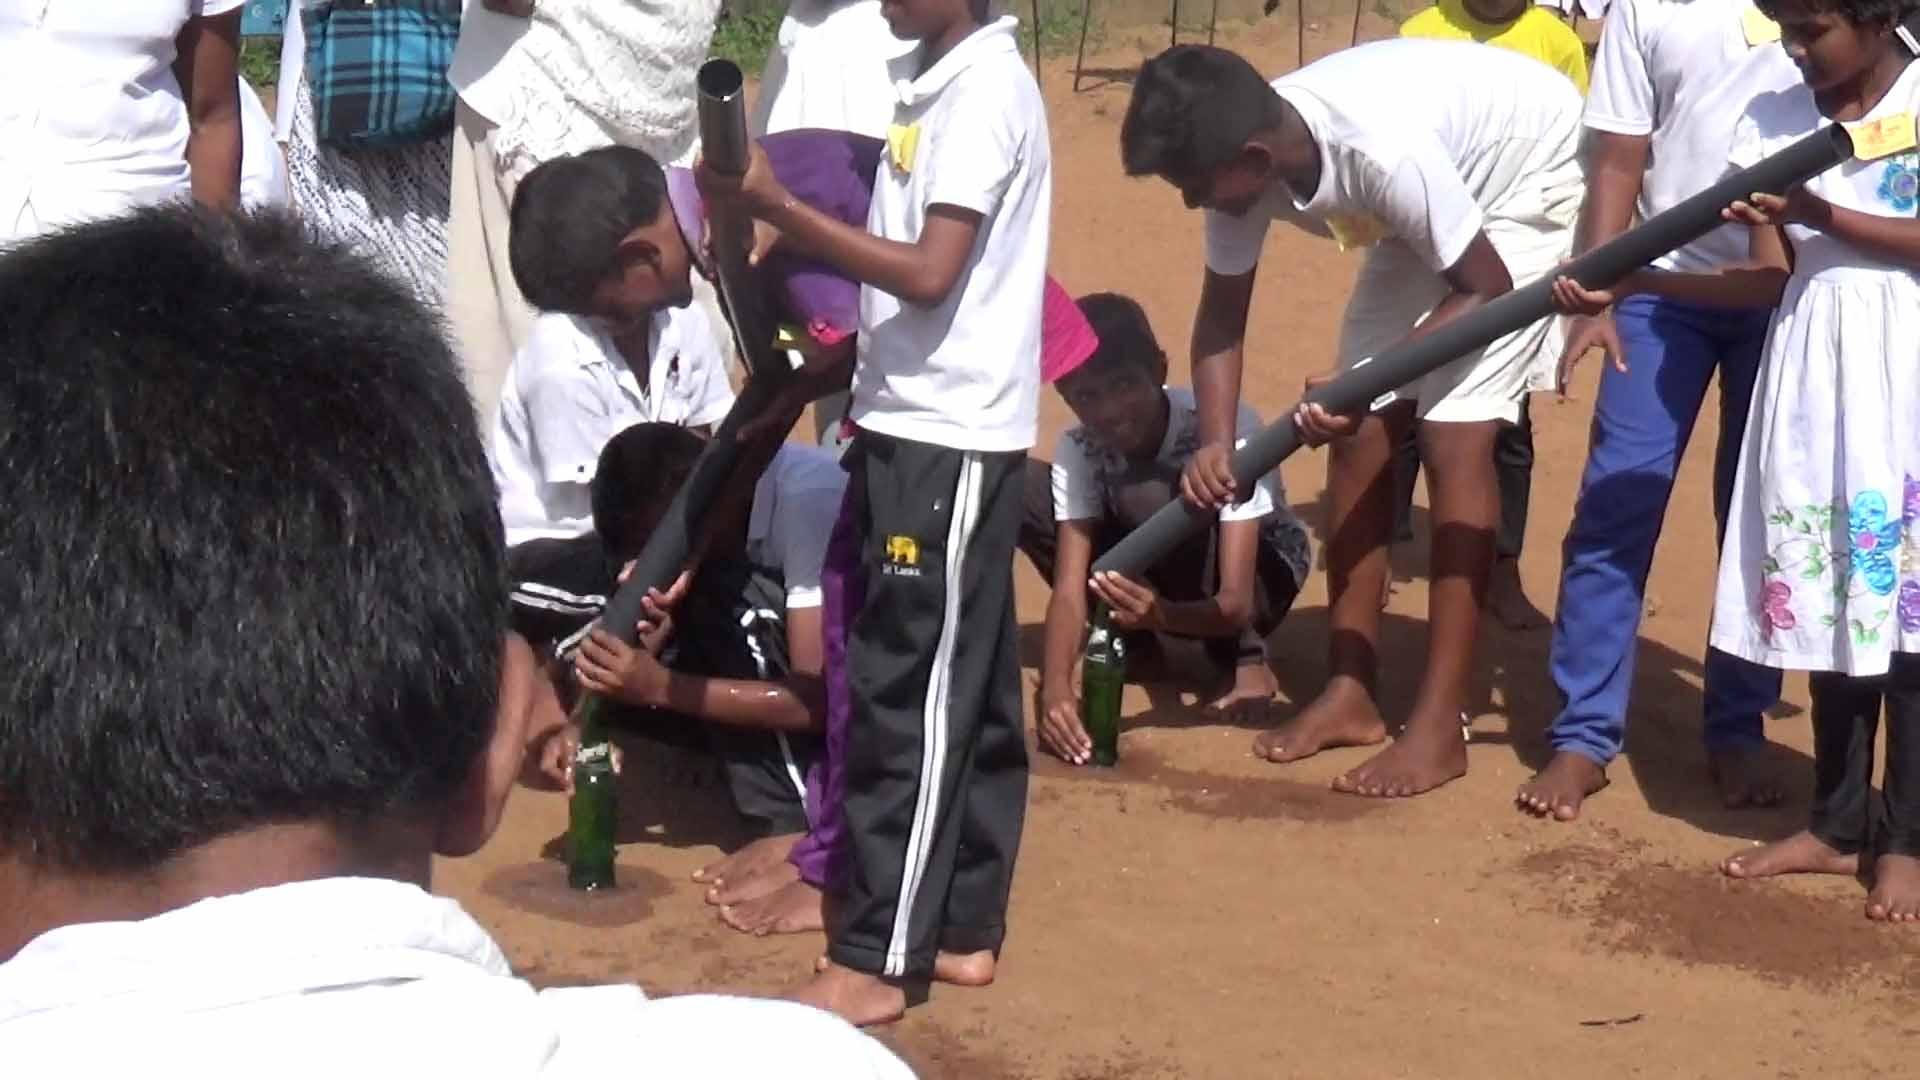 Sati Pasala Mindfulness Camp at Meethirigala Kanishta Vidyalaya-mindful games (23)